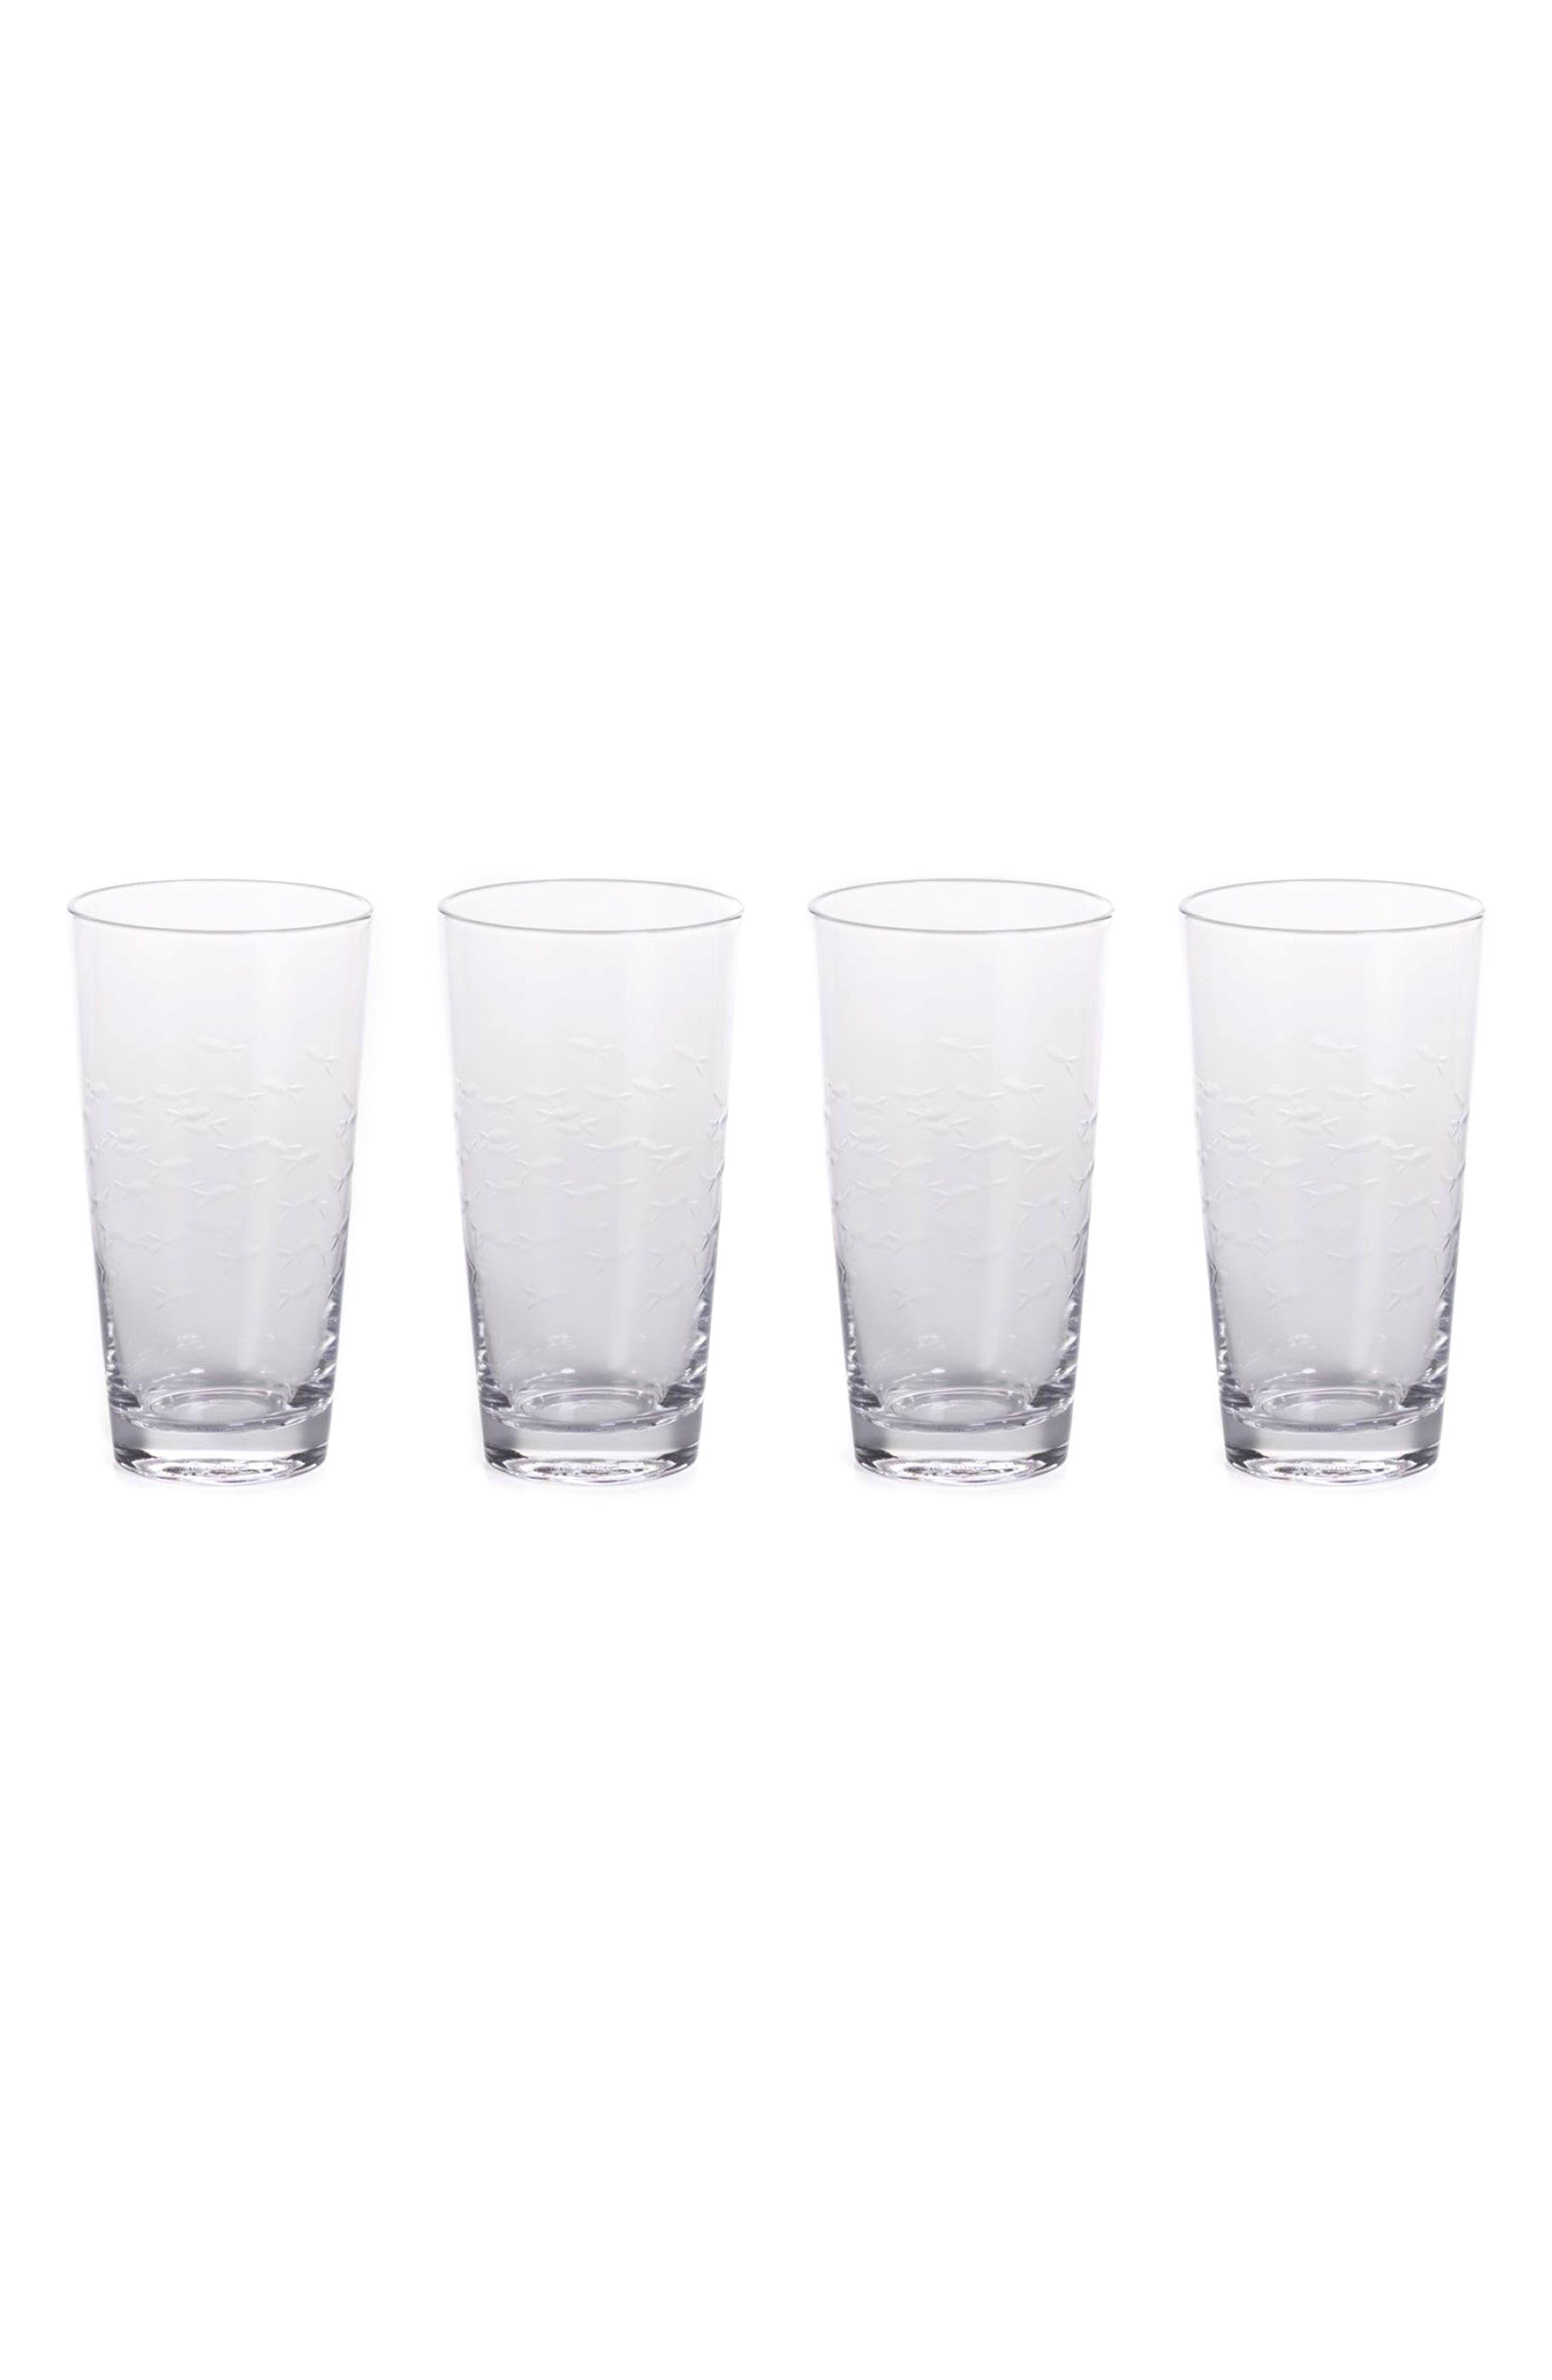 Keely Set of 4 Highball Glasses,                             Main thumbnail 1, color,